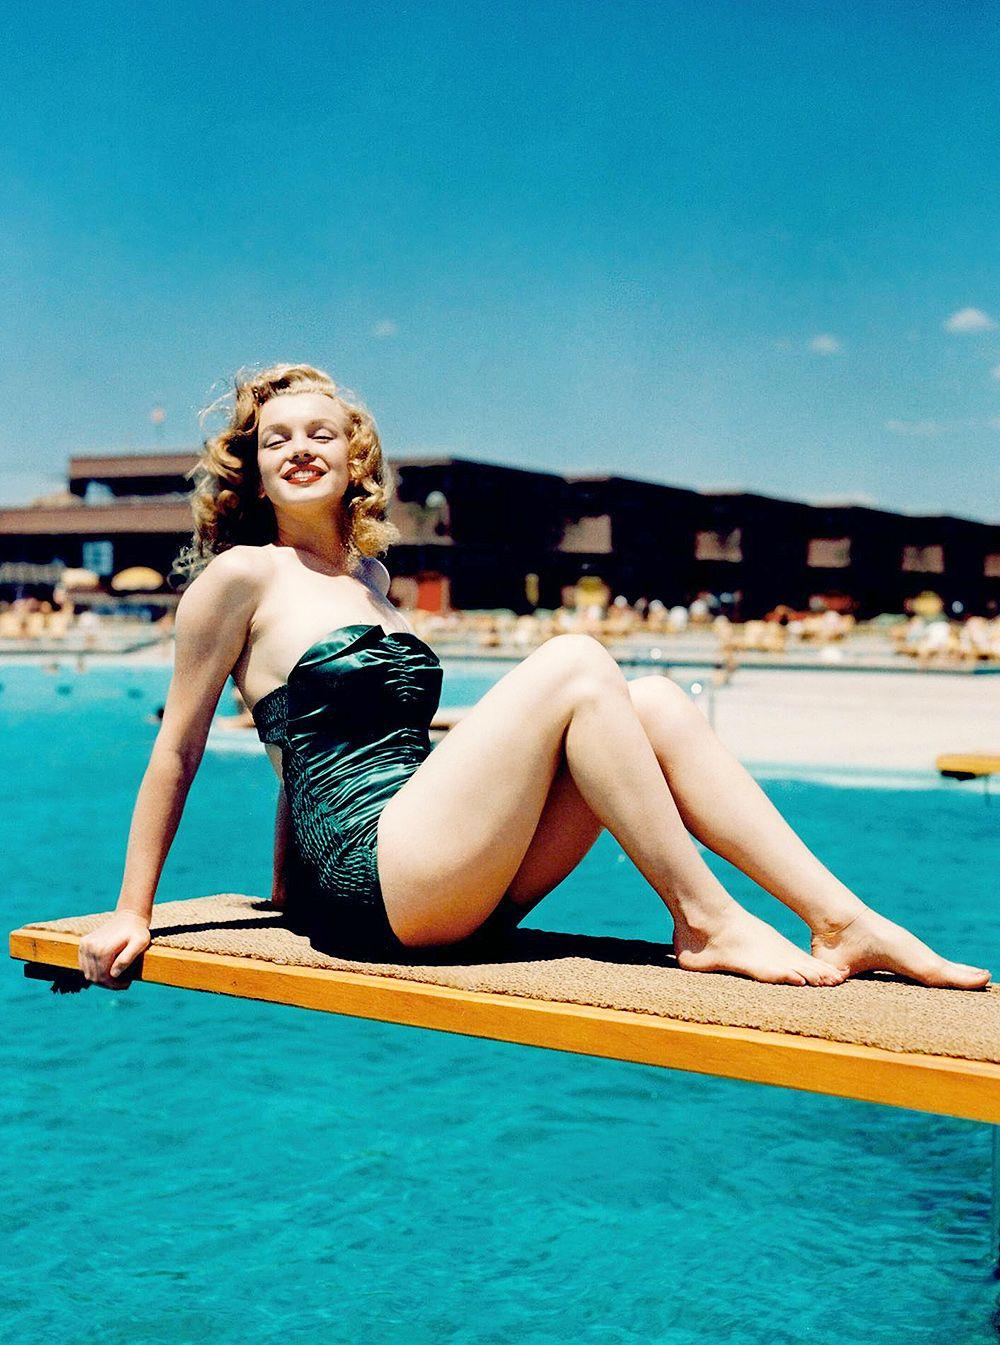 Vintage Color Camera Transparency Of Marilyn Monroe By Arthur Fellig Color  In Camera Transparency On Kodachrome Safety Film Of Marilyn Monroe By